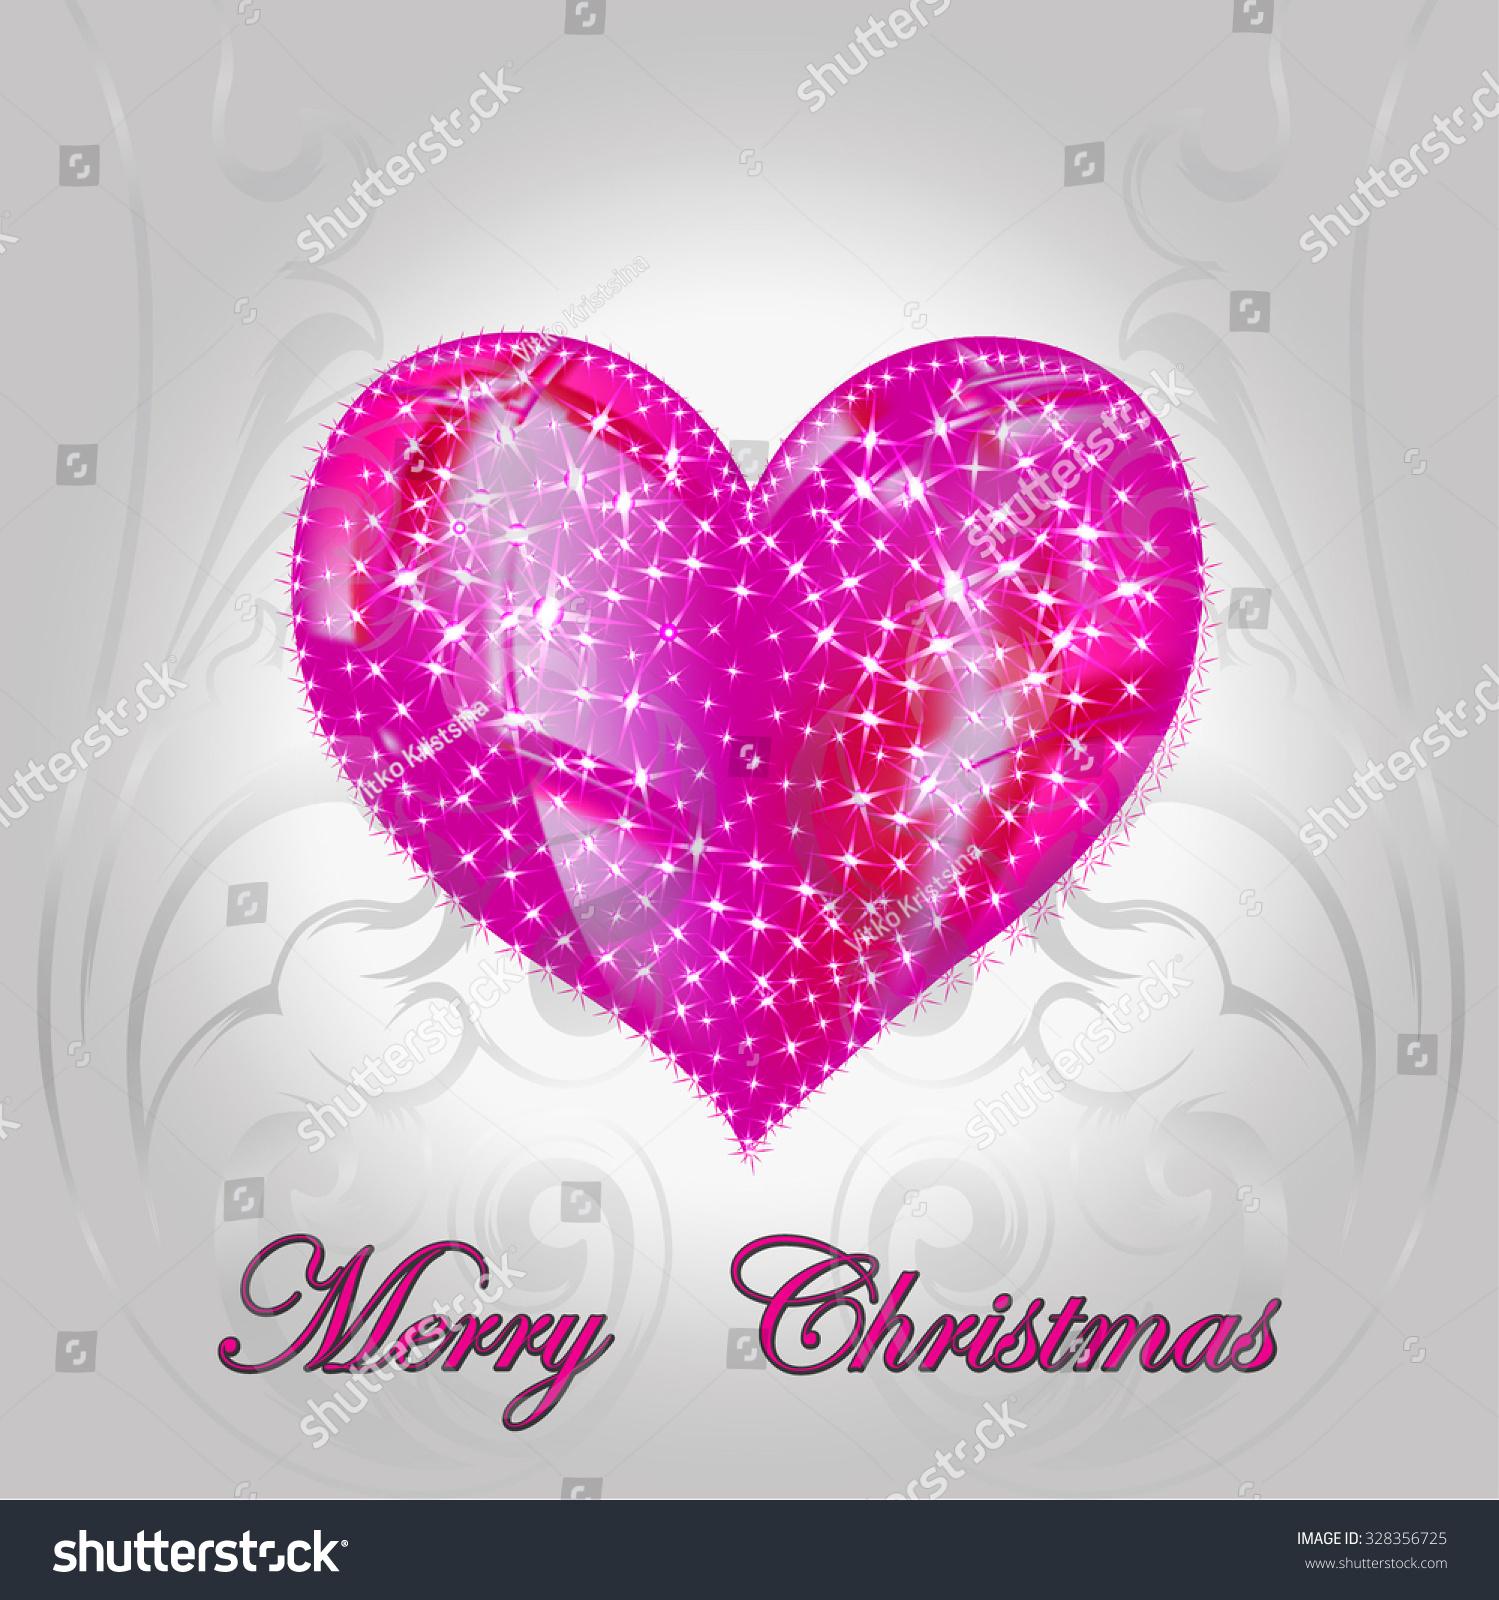 Family holiday winter holidays december heart stock vector 328356725 family holiday winter holidays december heart stock vector 328356725 shutterstock m4hsunfo